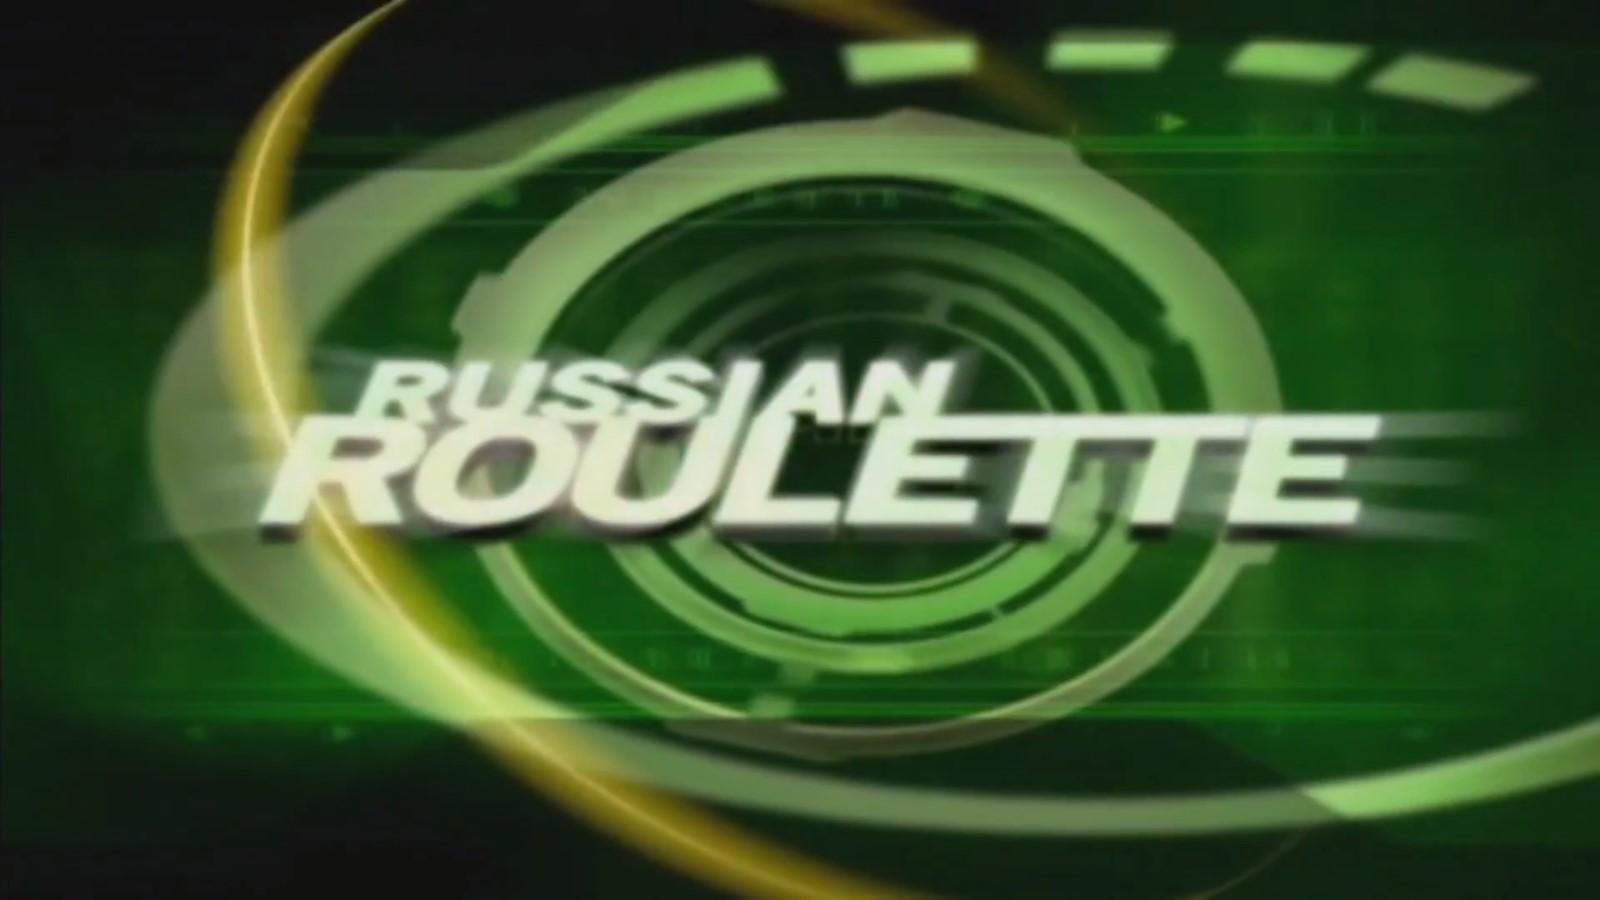 bigjon russian roulette pc game